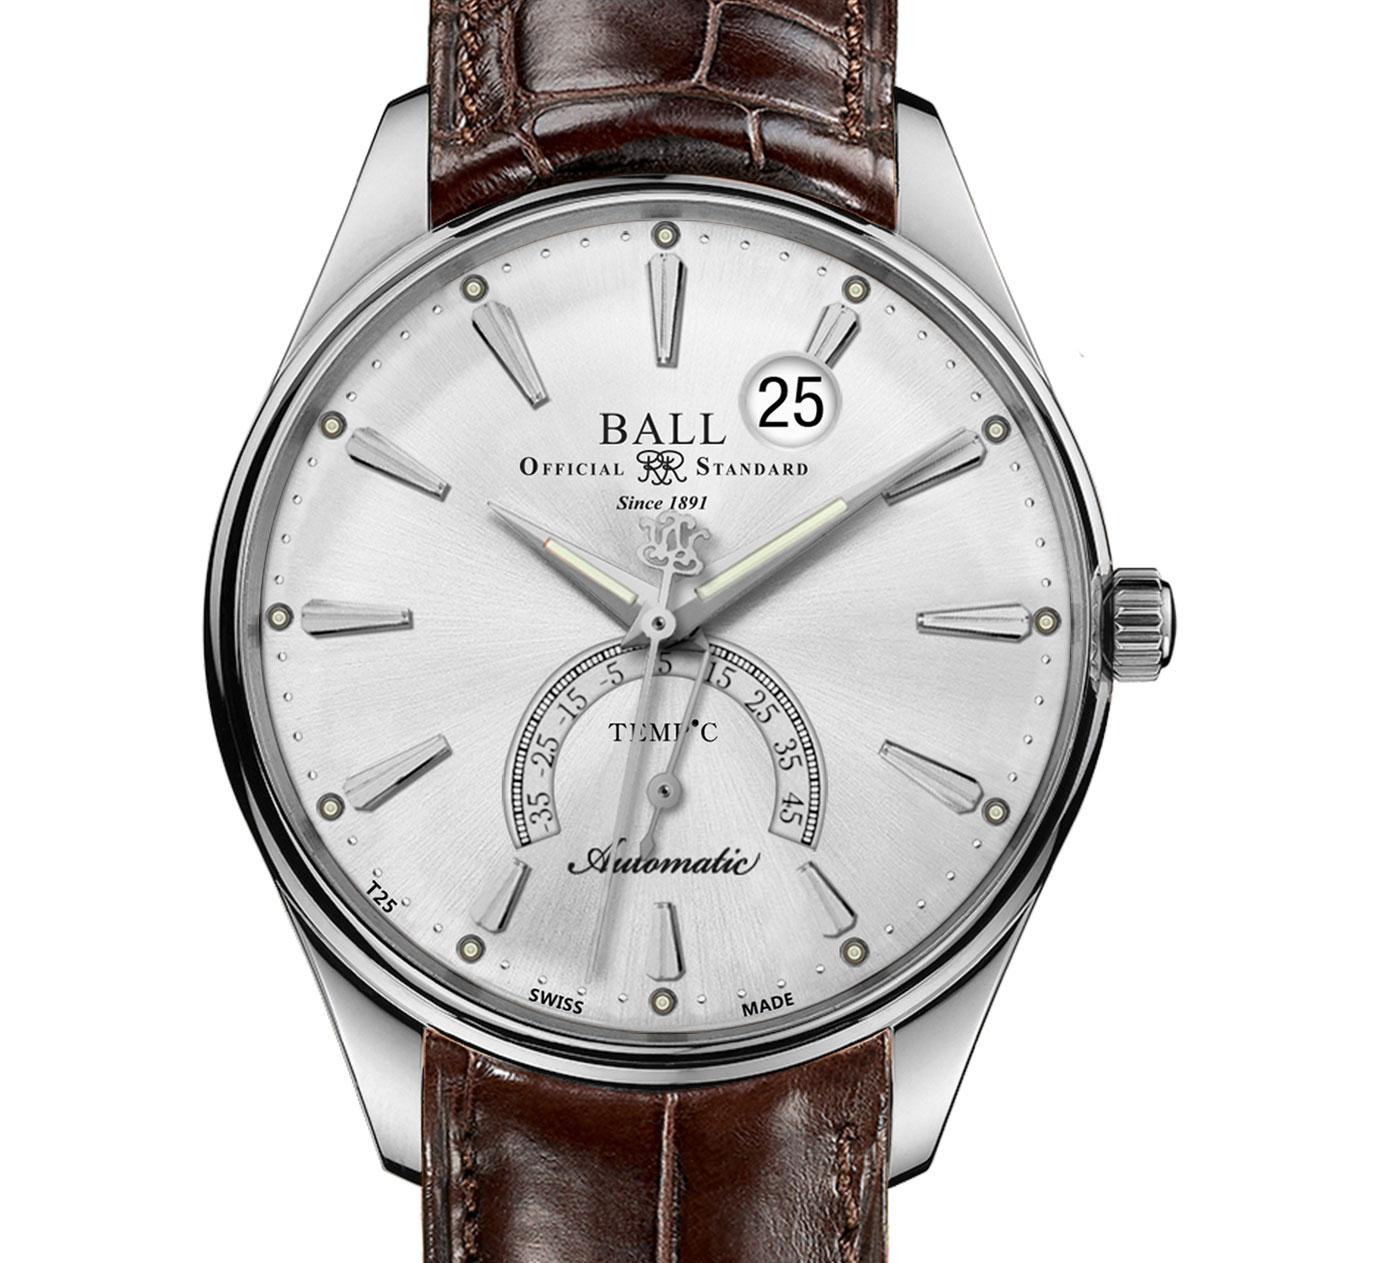 Ball-Watch-Trainmaster-Kelvin-1.jpg